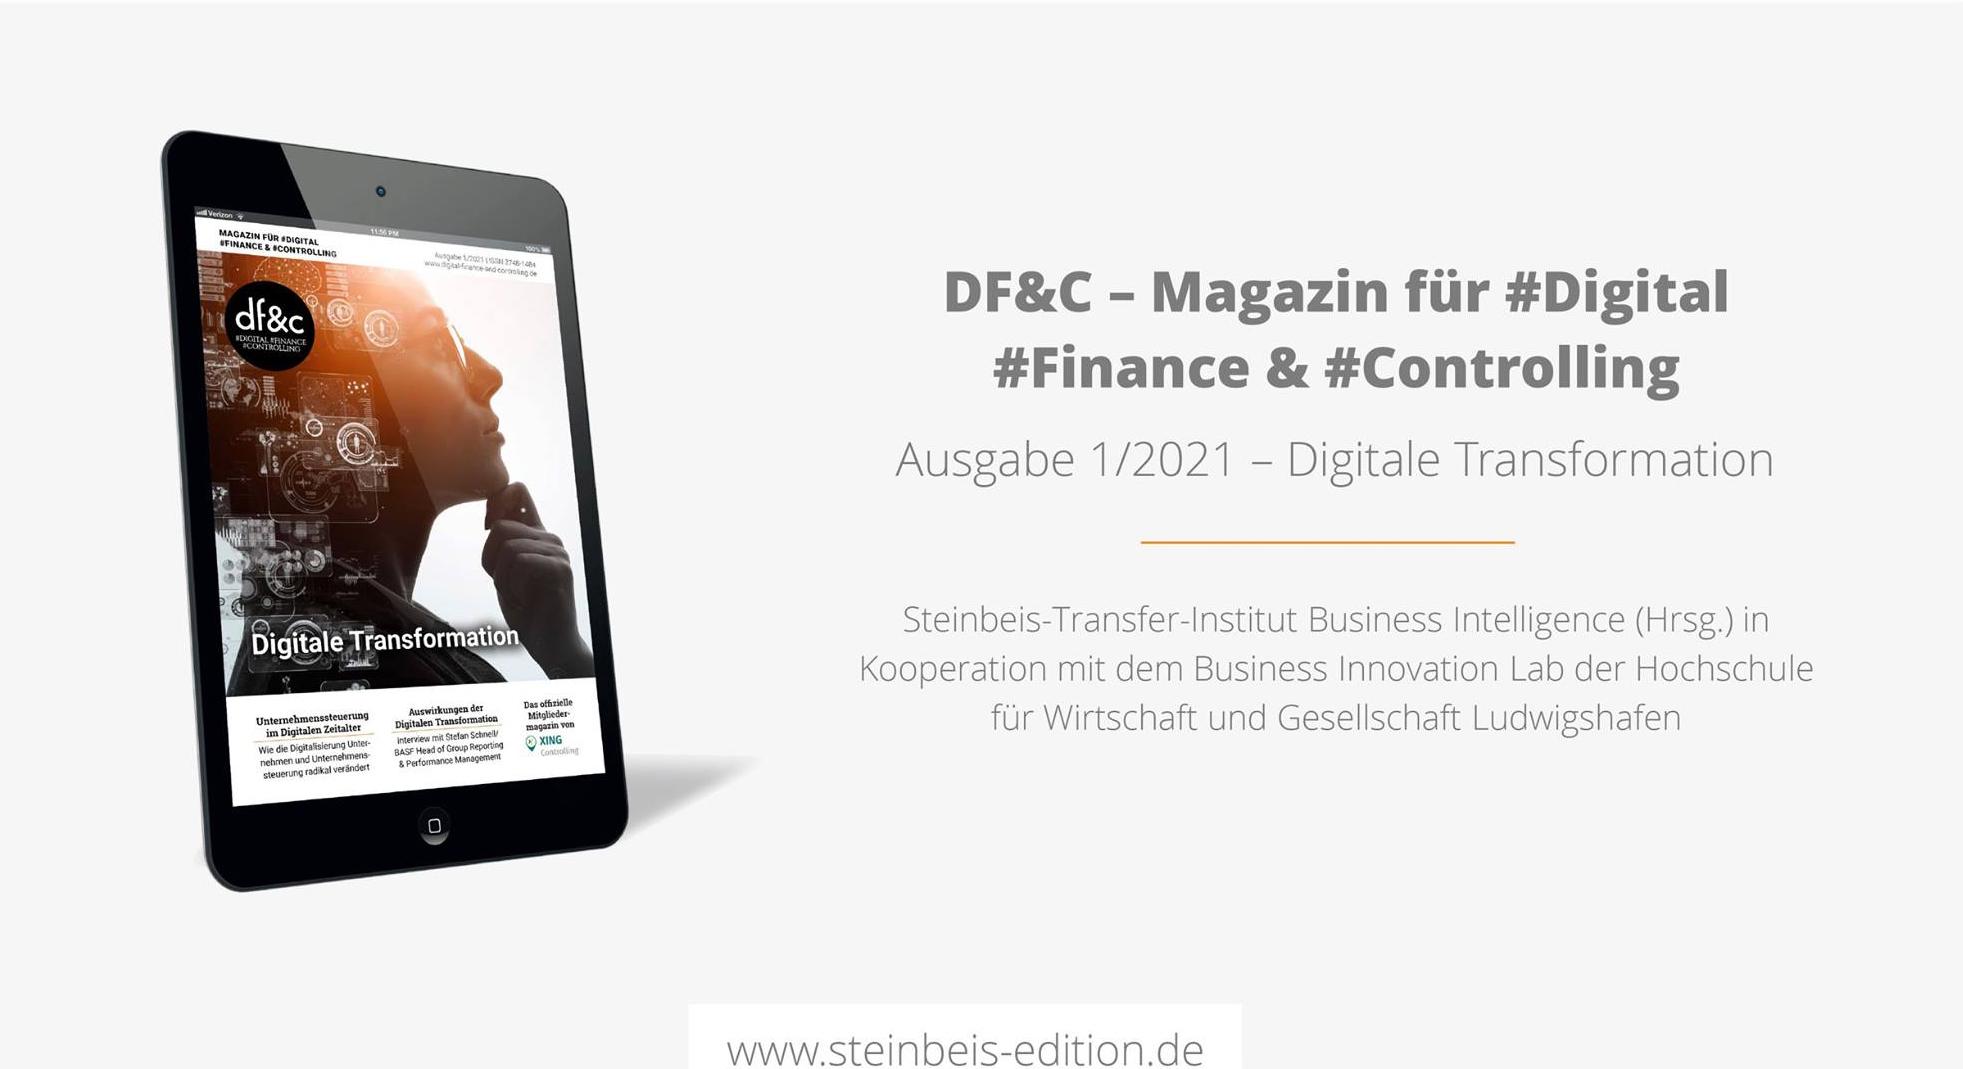 DF&C – Magazin für #Digital #Finance & #Controlling